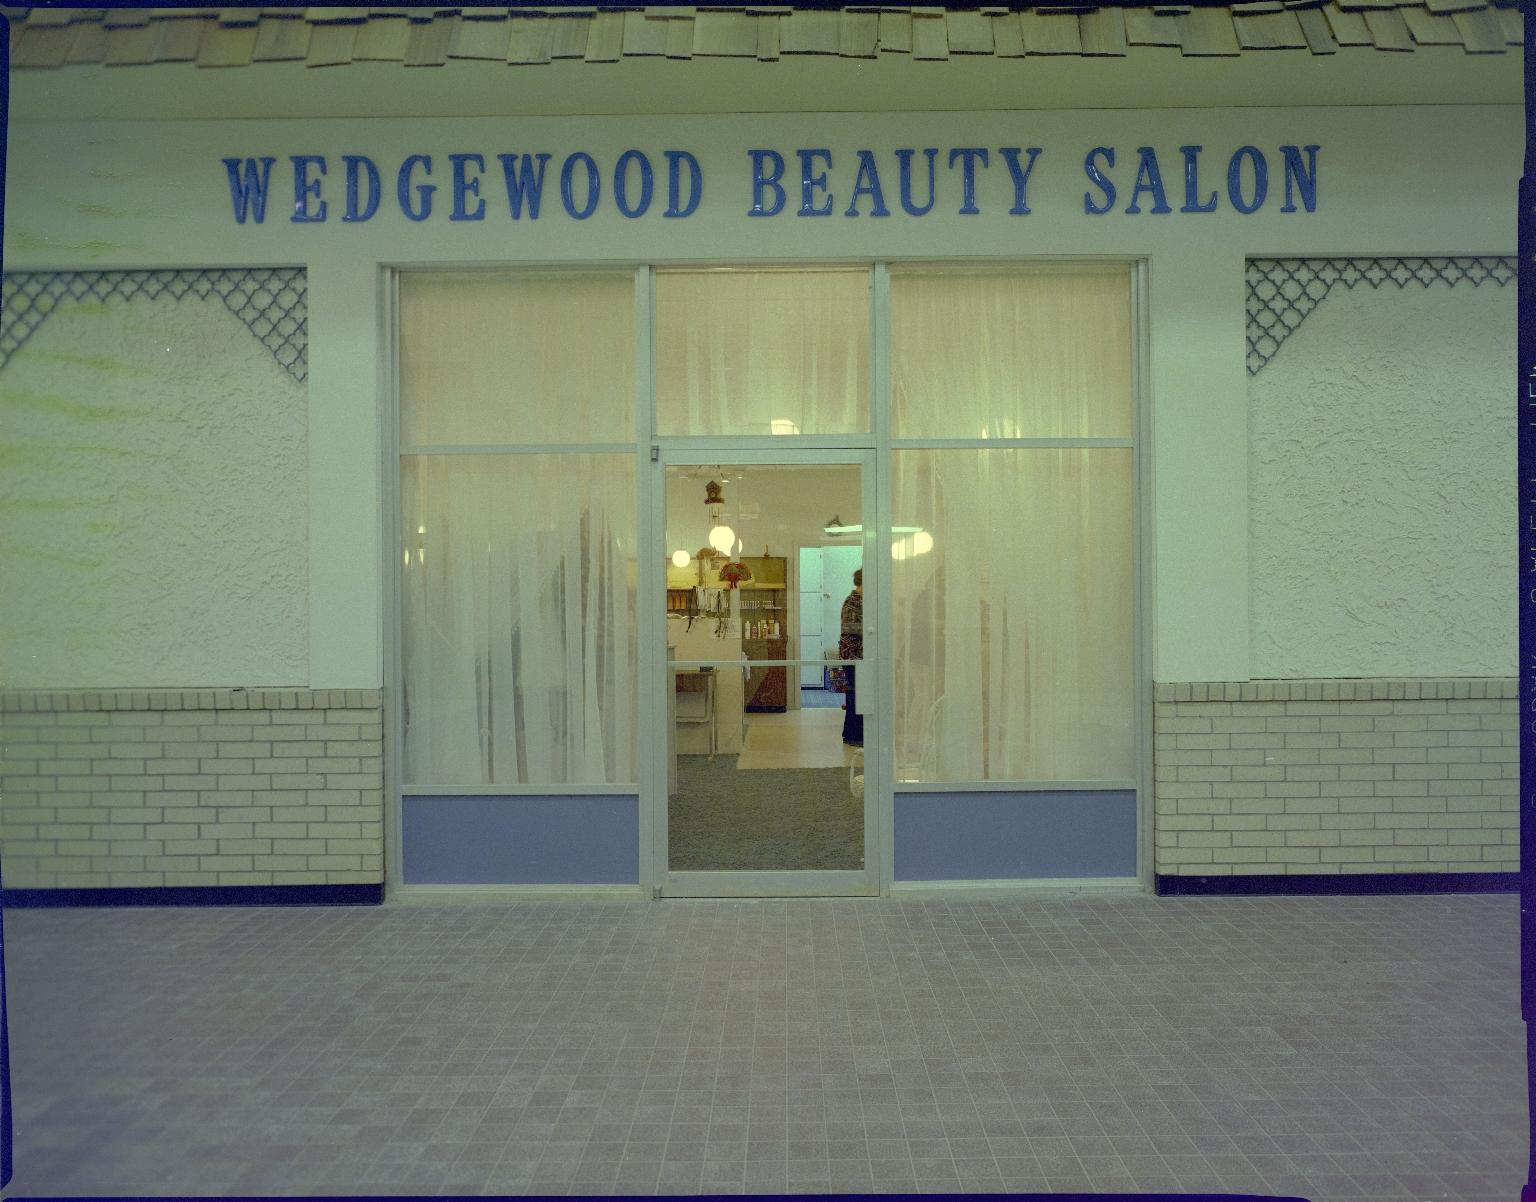 Paducah Mall/Wedgewood Beauty Salon